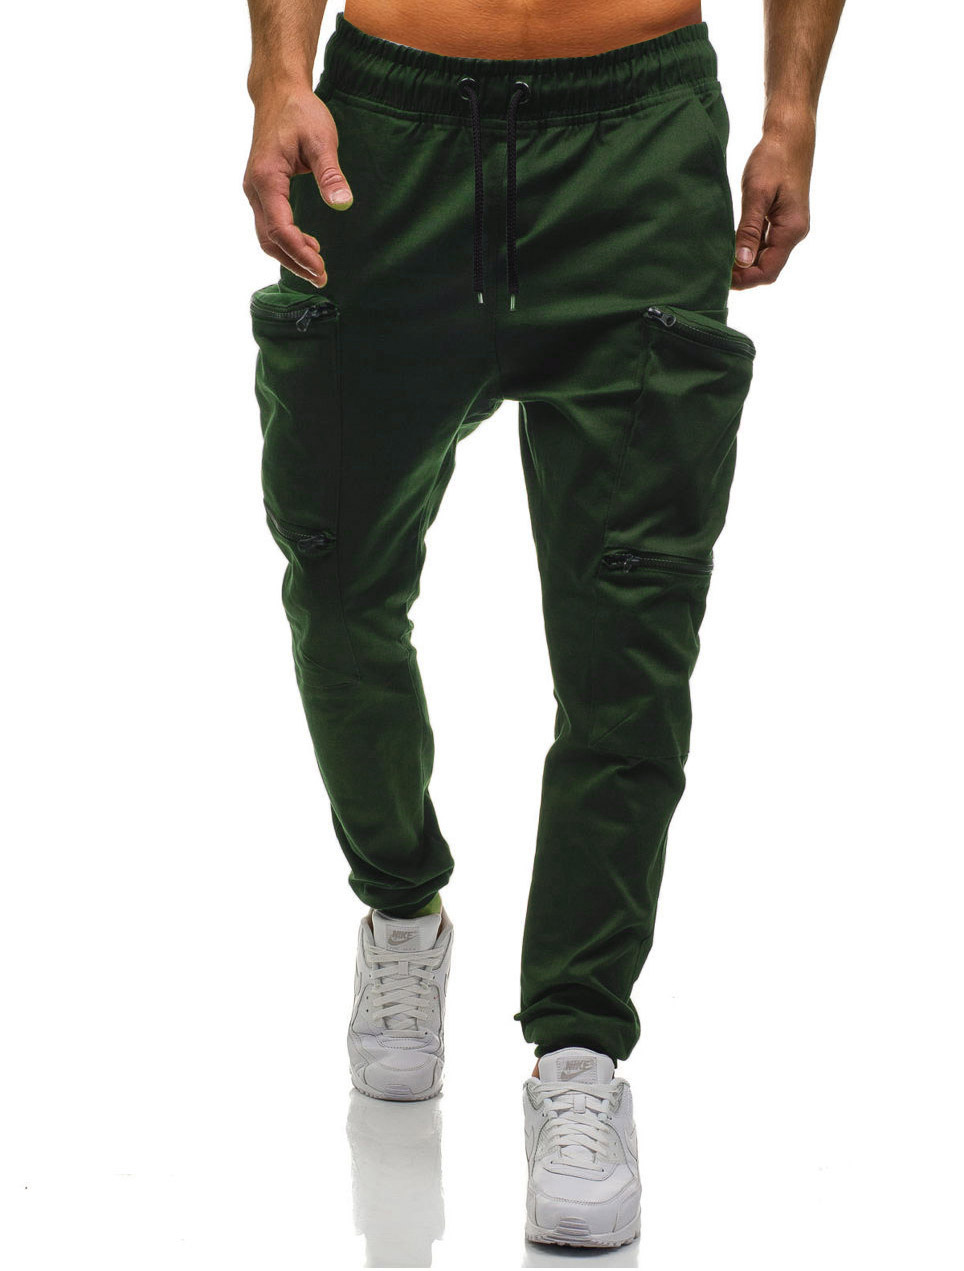 HTB1PJPjLVzqK1RjSZFoq6zfcXXag Mens Joggers 2019 New Red Camouflage Multi-Pockets Cargo Pants Men Cotton Harem Pants Hip Hop Trousers Streetwear XXXL